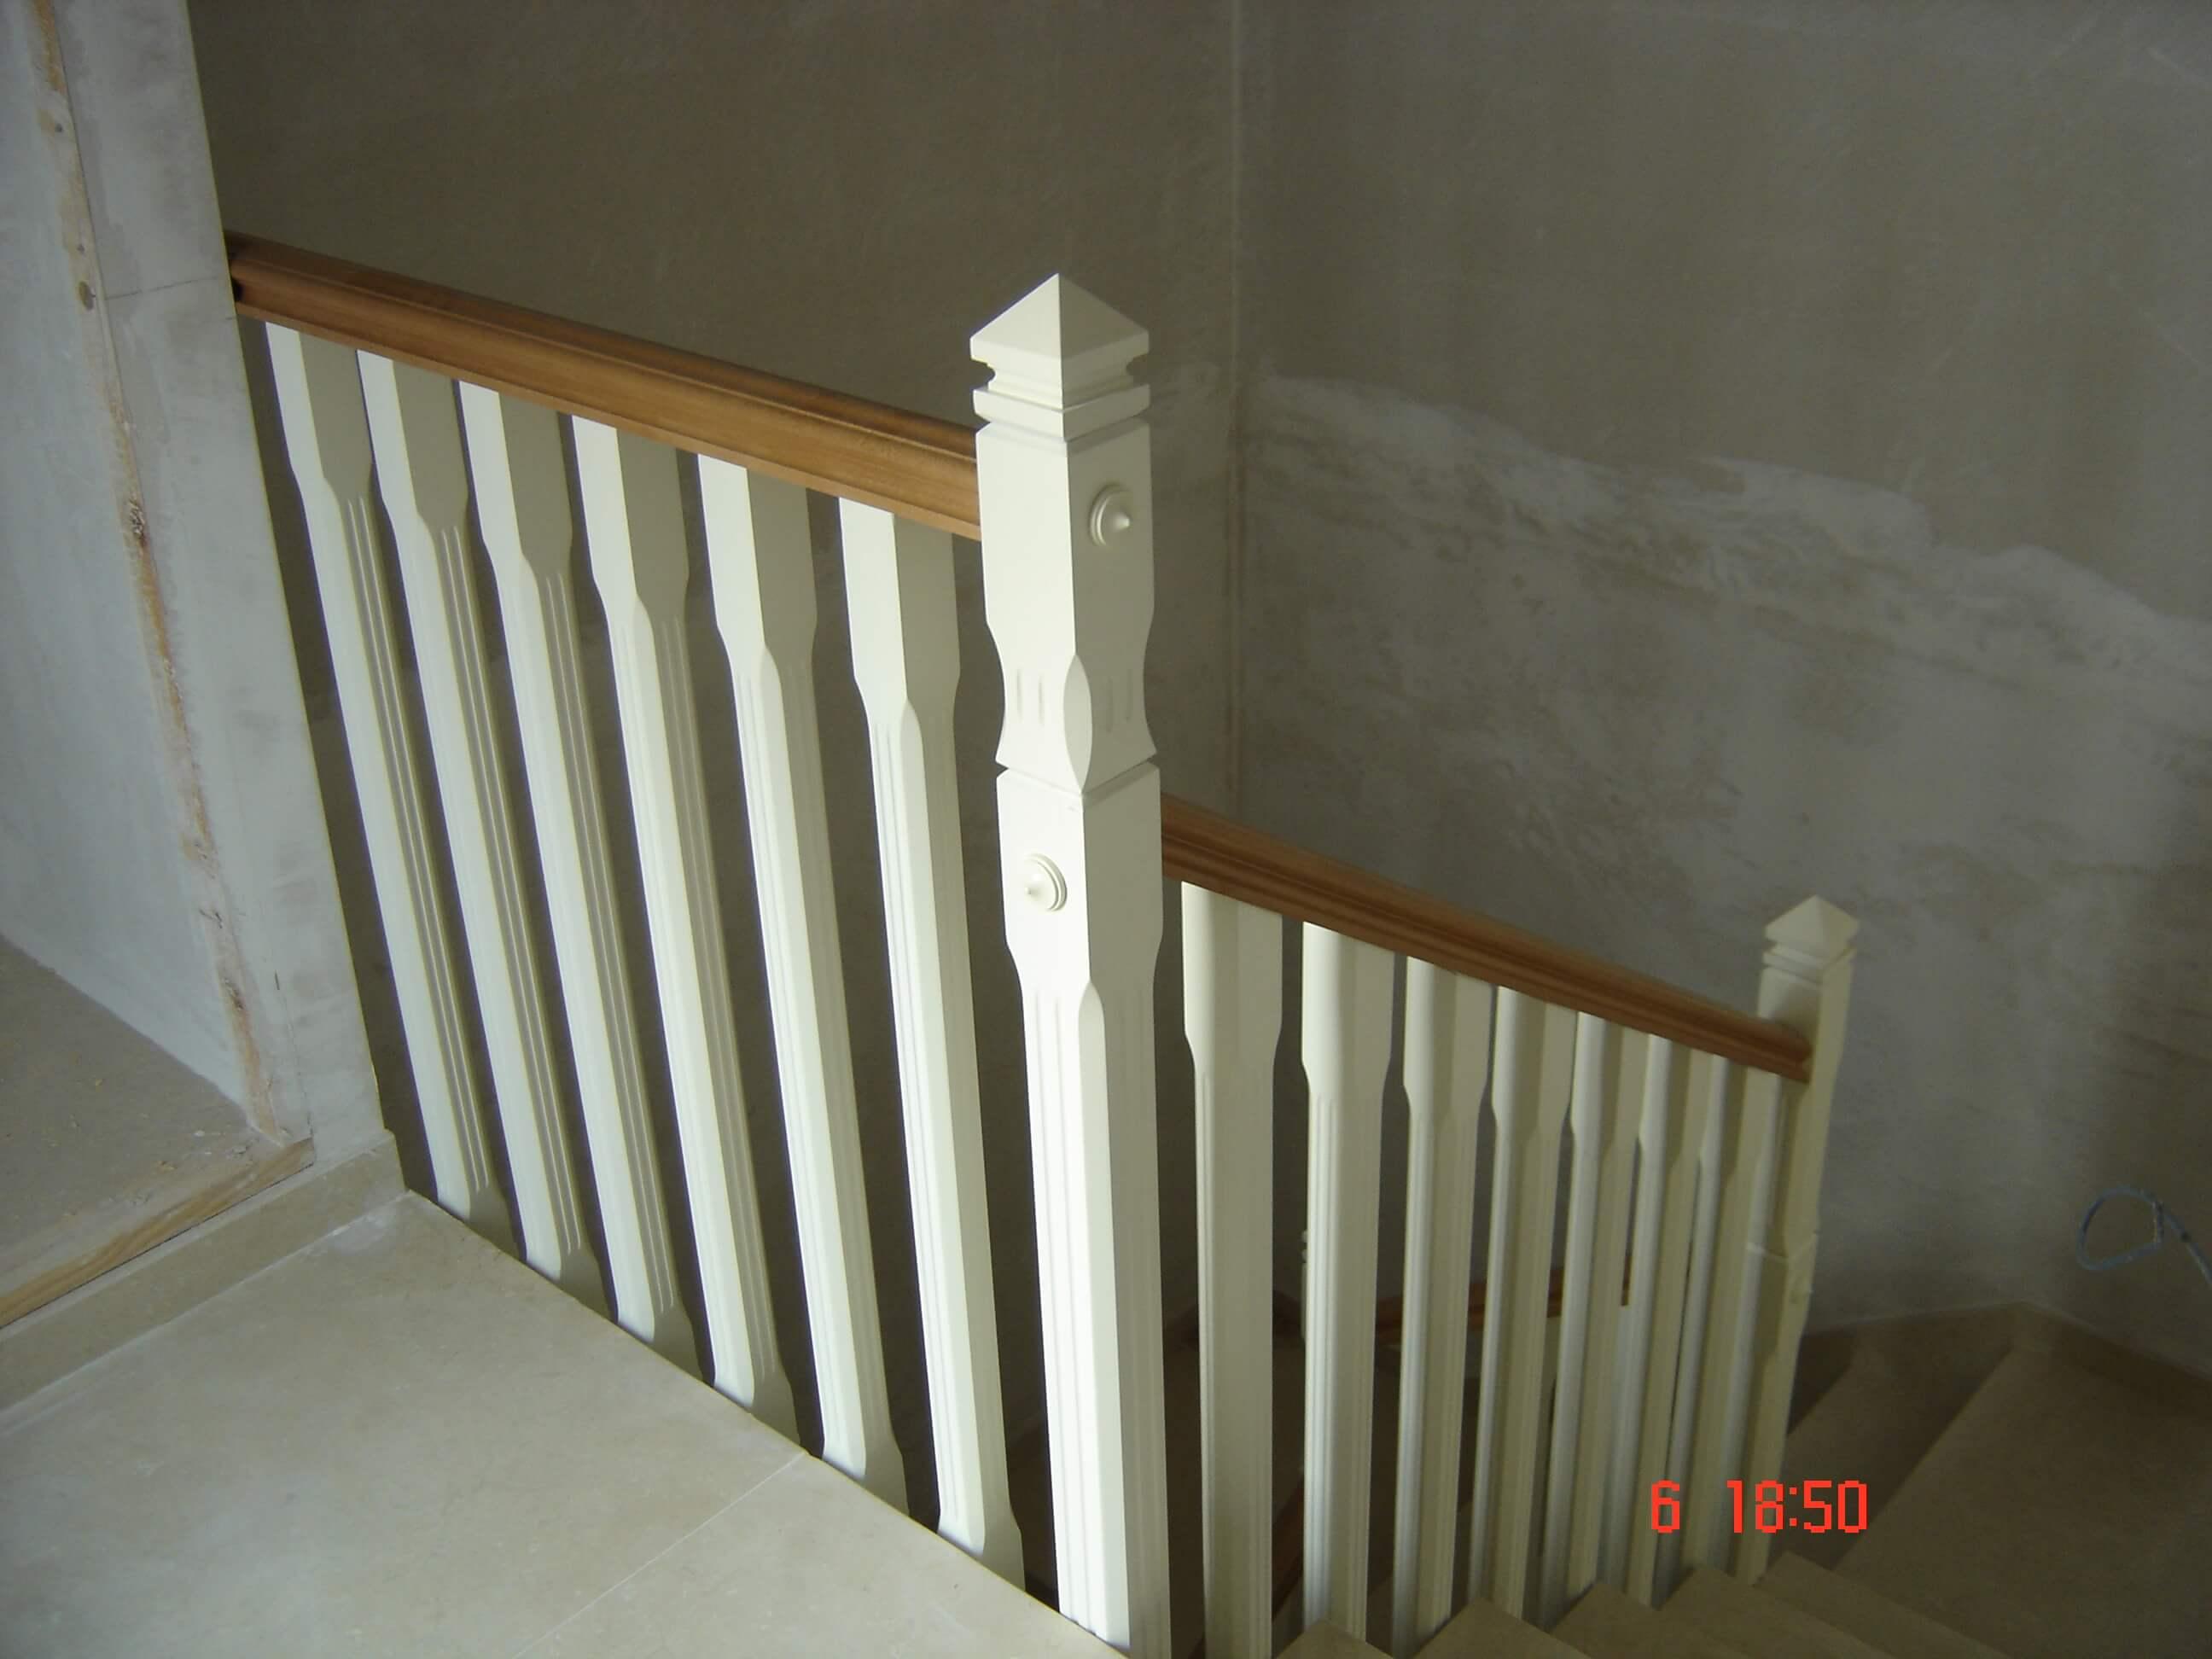 Barandillas de madera barandilla de madera exterior with - Barandillas madera exterior ...